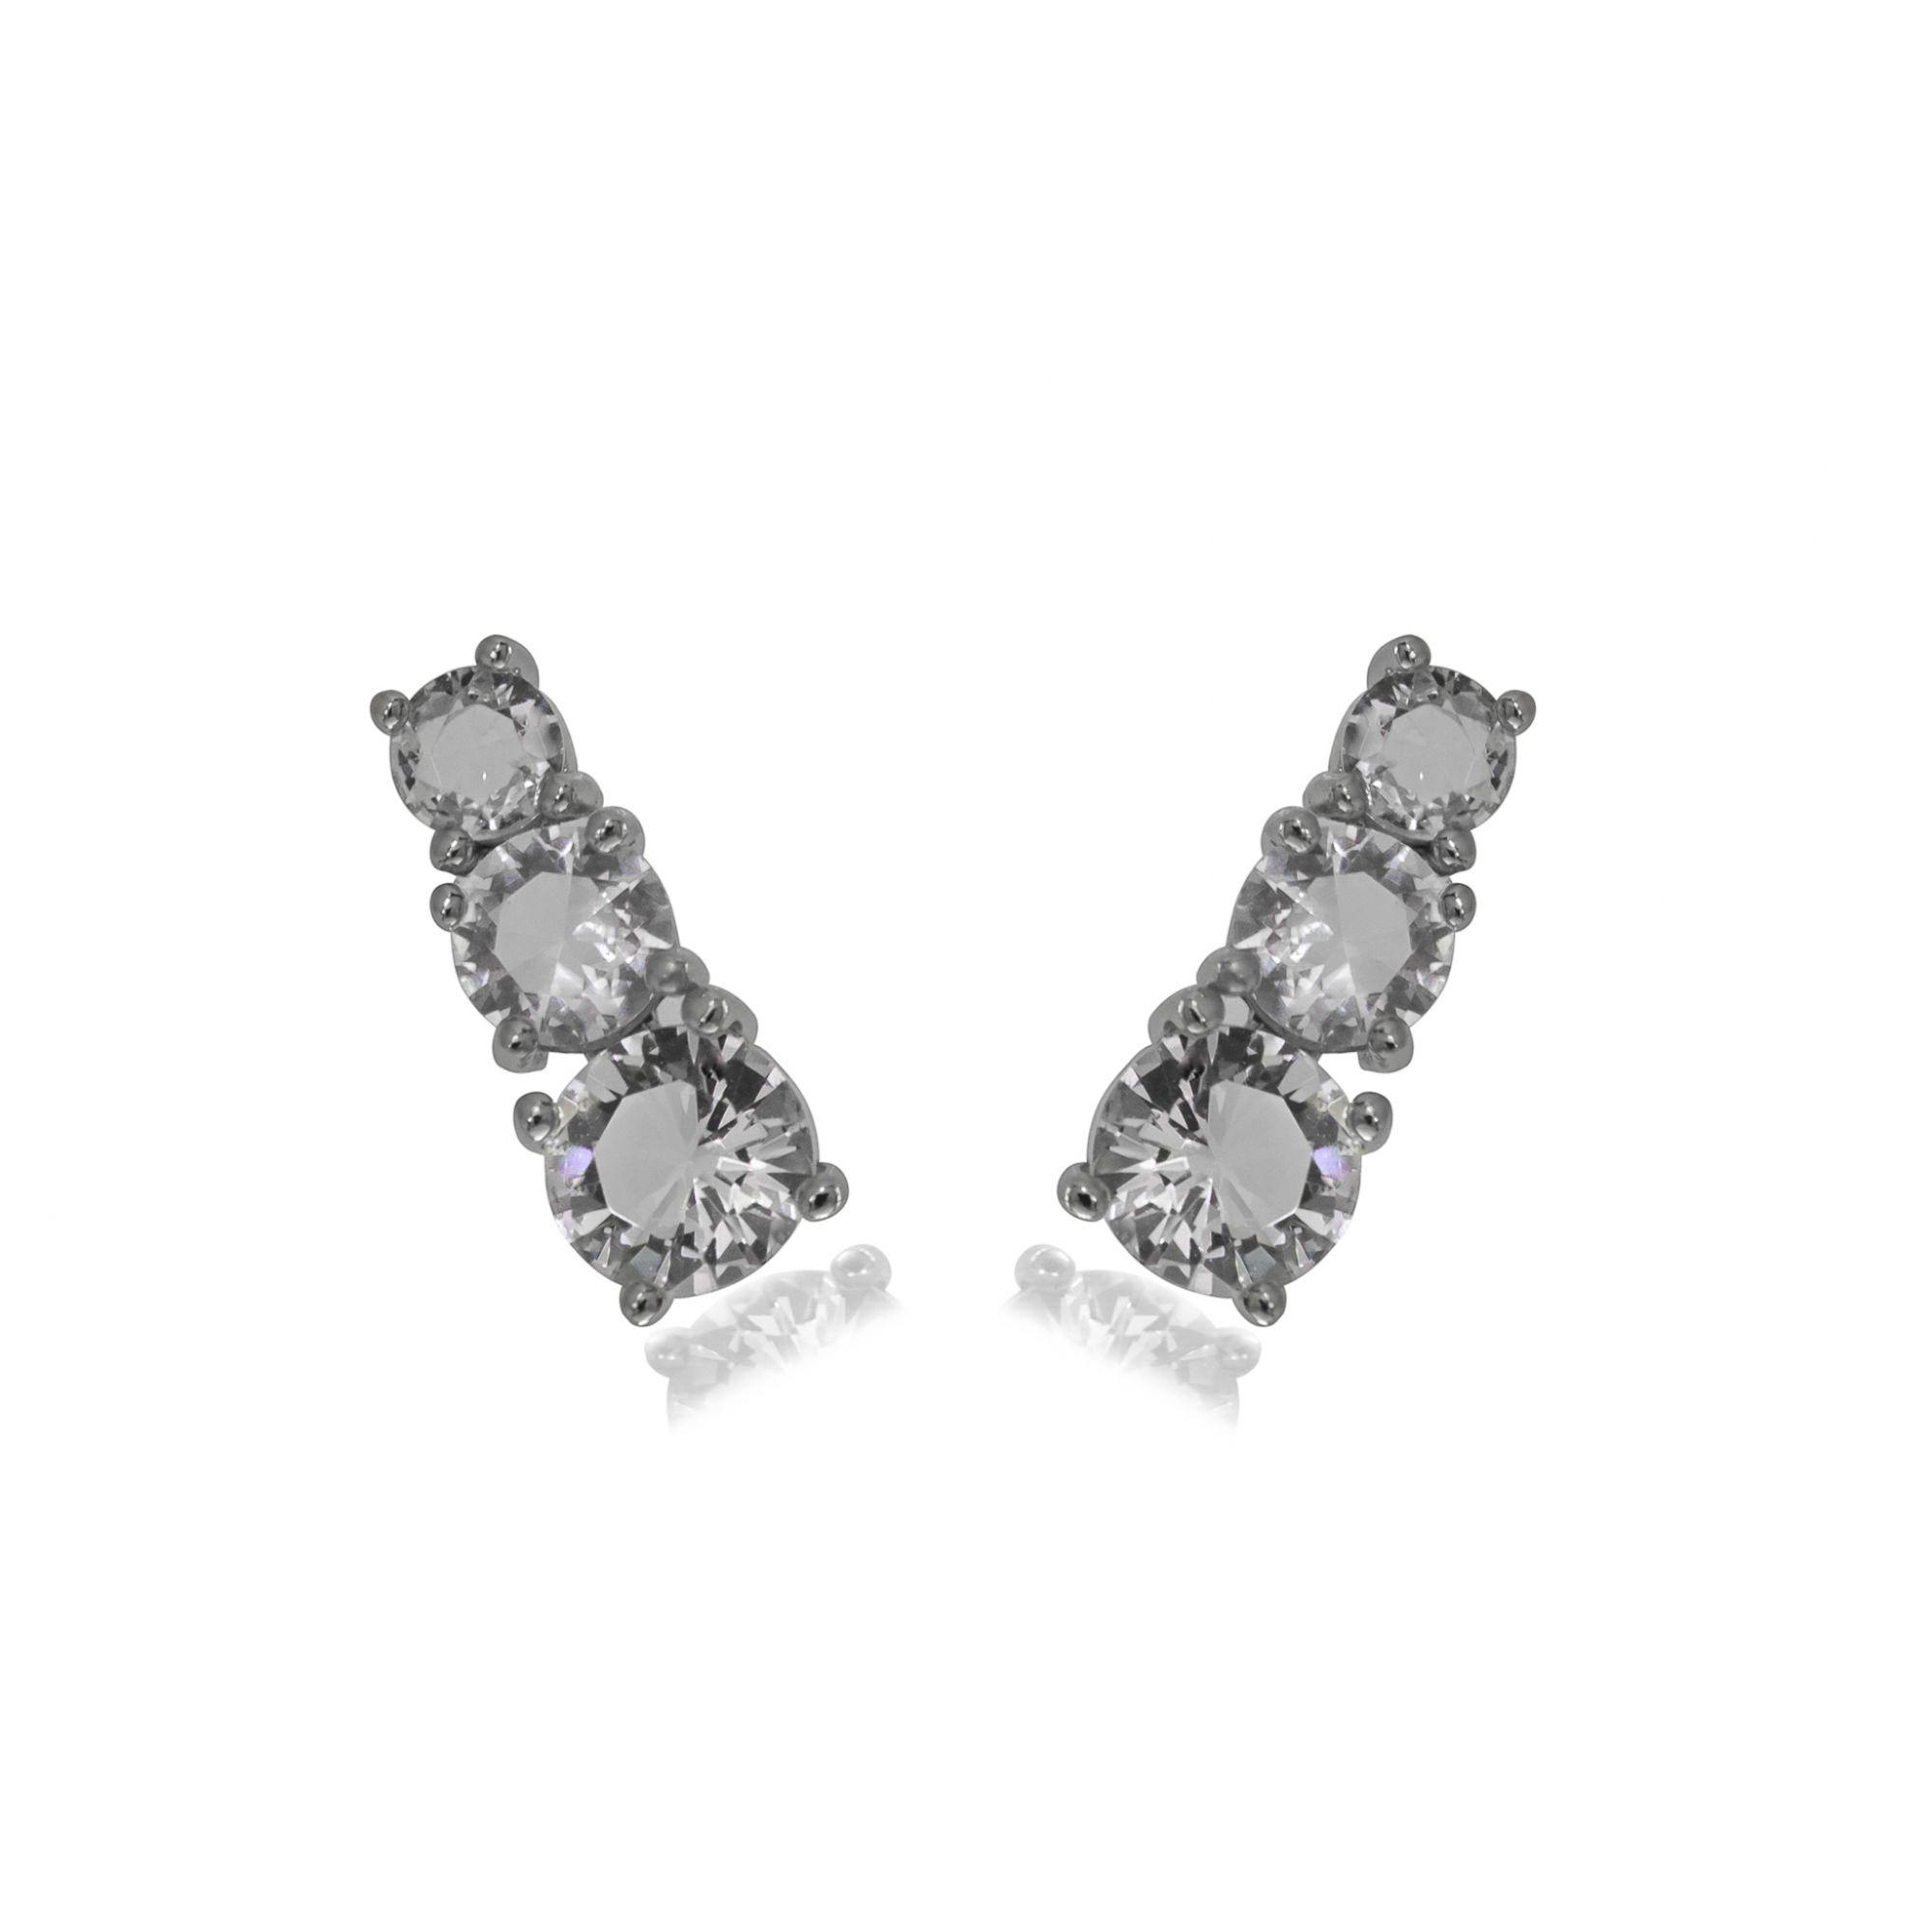 Brinco Ear cuff folheado semijoia em cristal 3 pedras